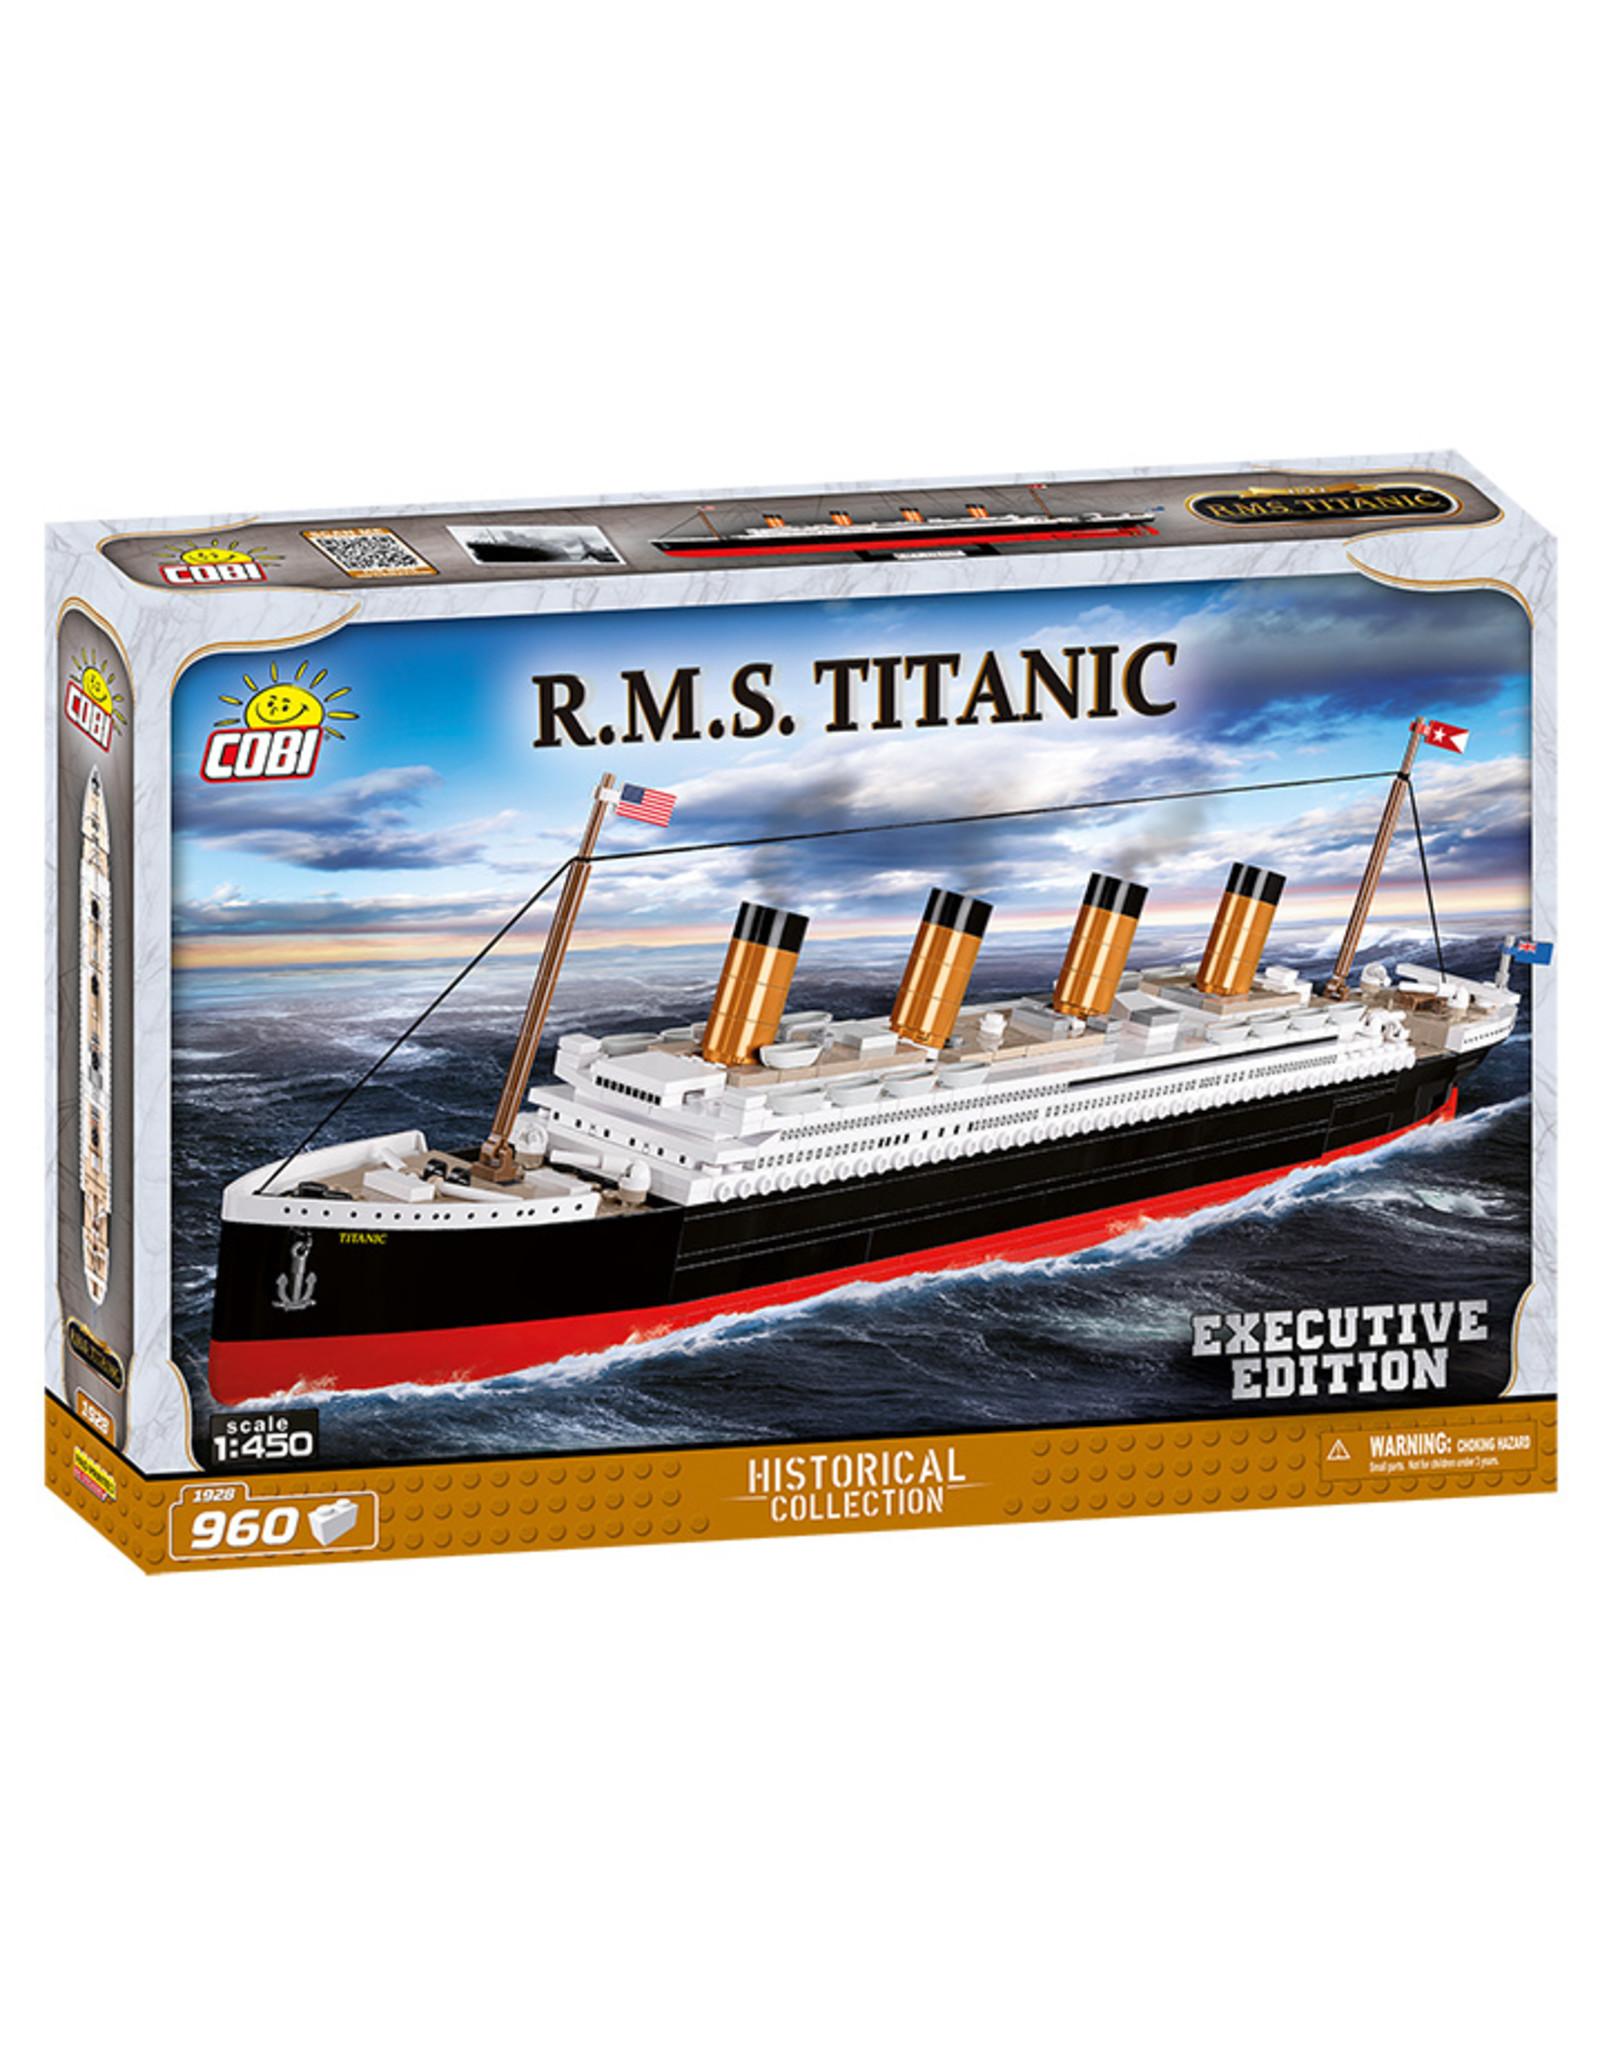 COBI COBI 1928 R.M.S. Titanic Executive Edition